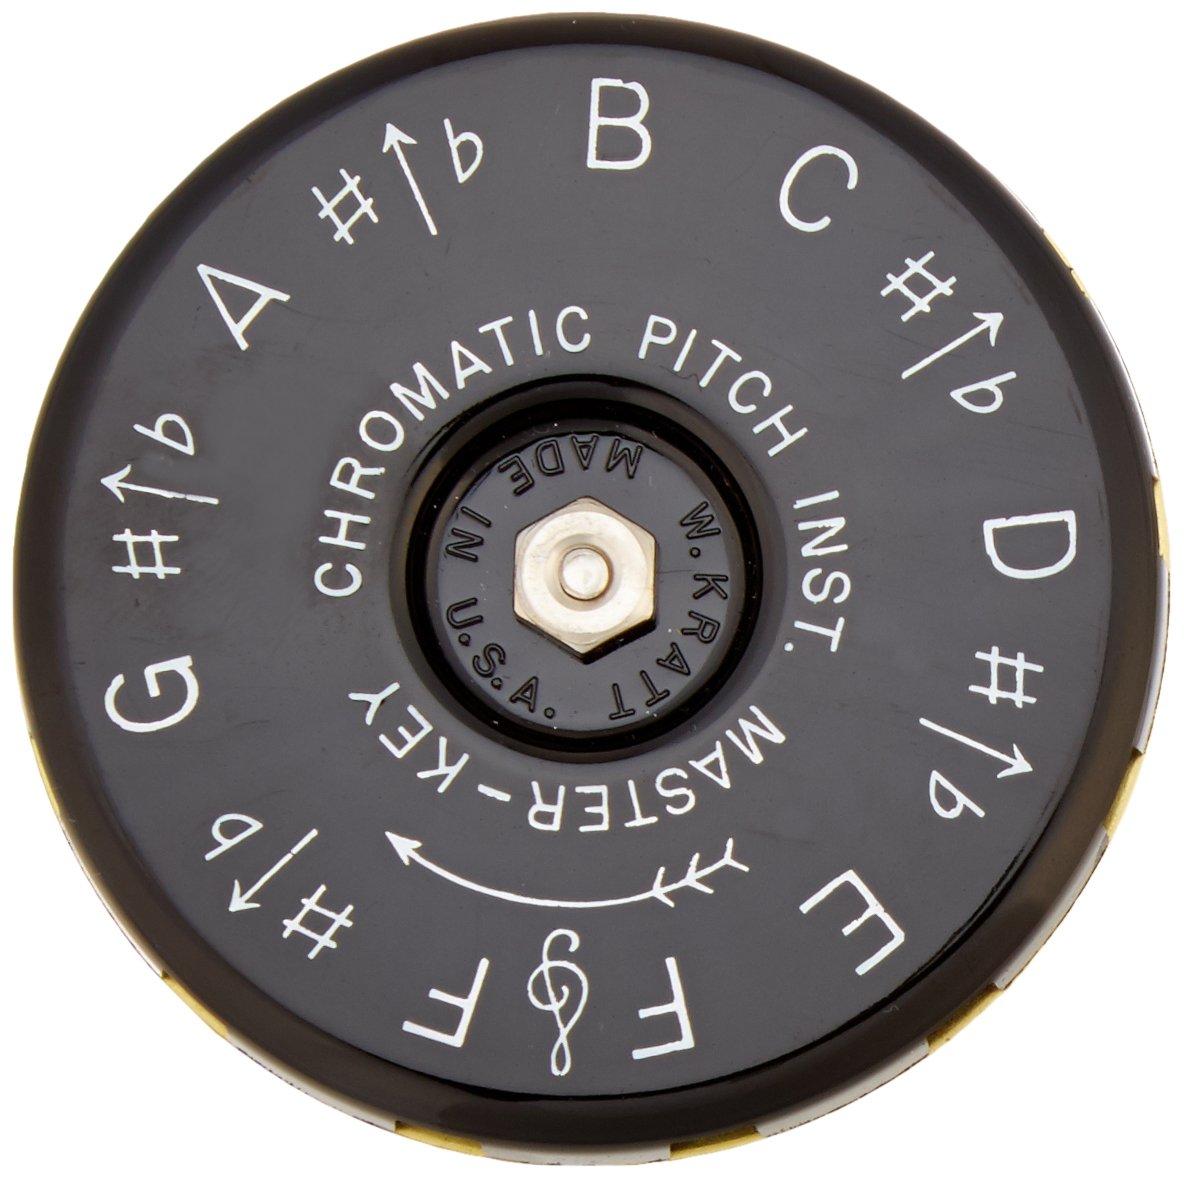 Kratt MK1 Master Key Chromatic Pitch Pipe (F to F) by Kratt (Image #3)